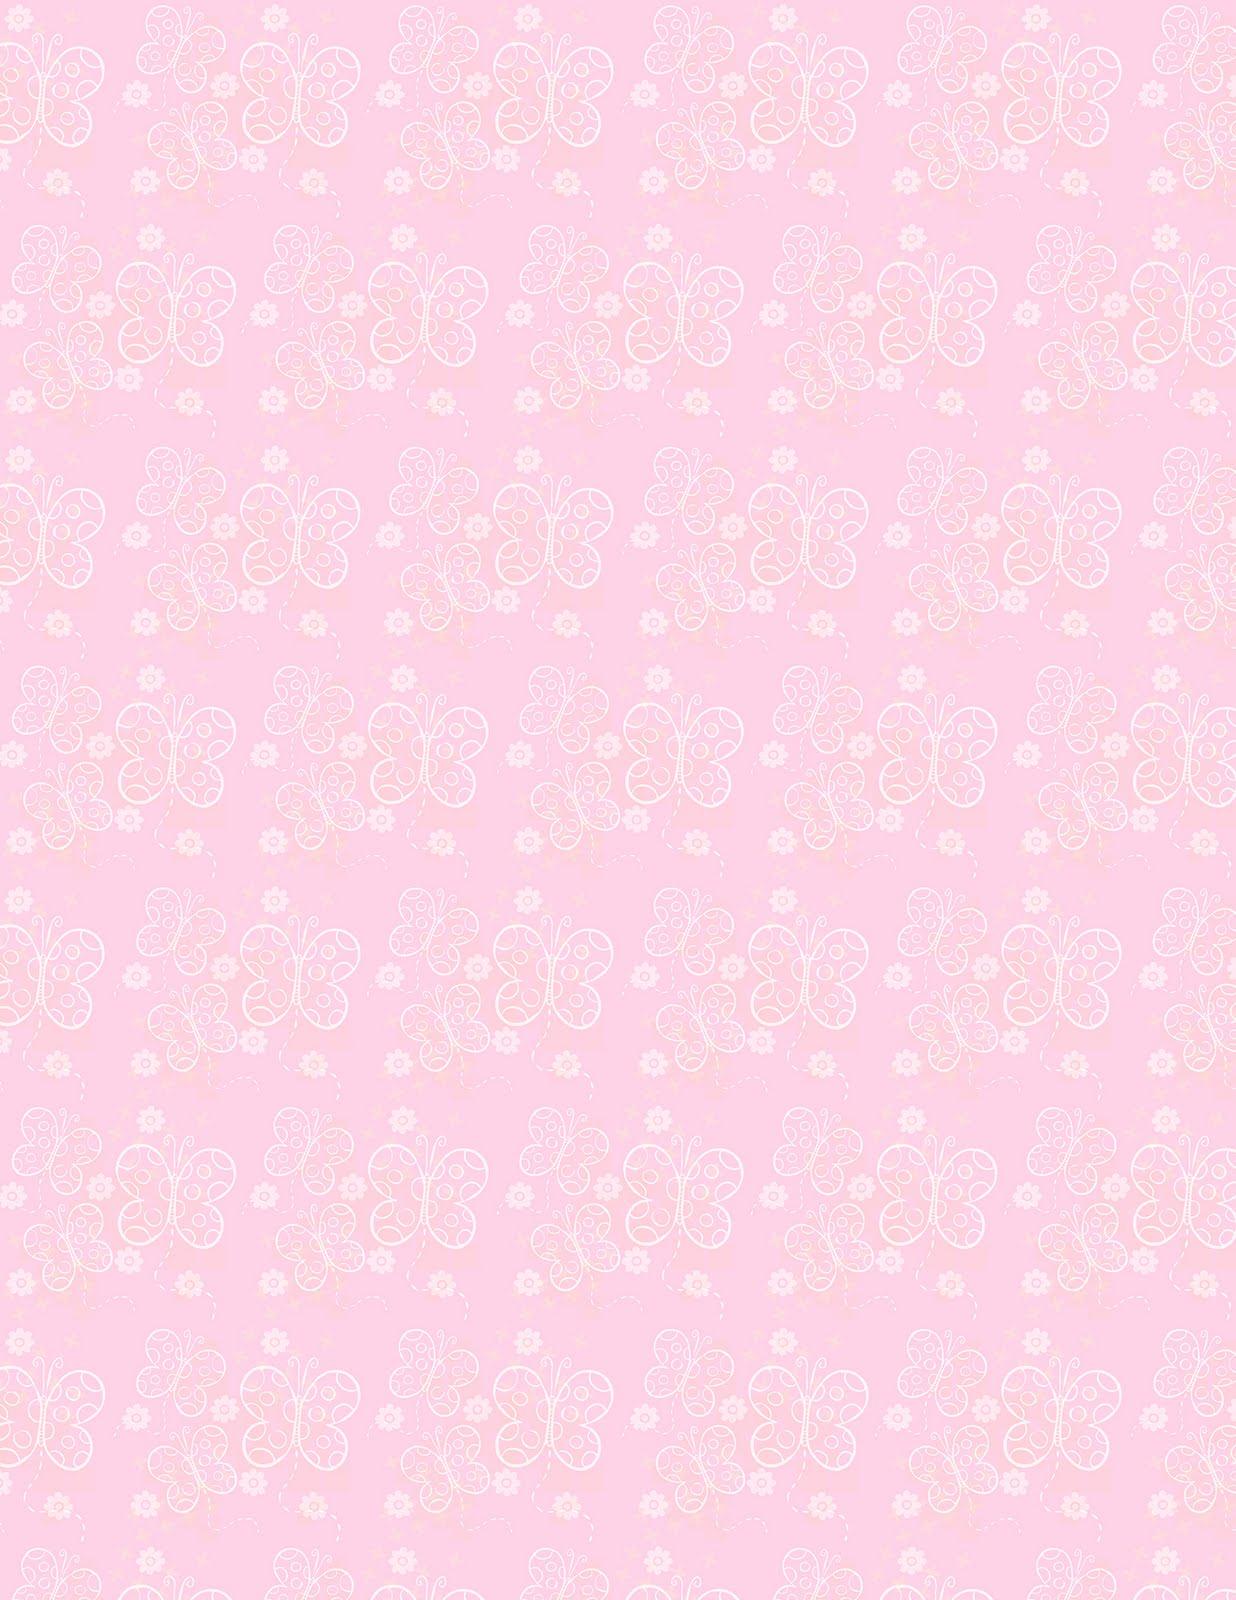 http://2.bp.blogspot.com/_cNYiQ_wdb2g/S9C-ILcj5LI/AAAAAAAAA_E/PwiXJKGs0pI/s1600/butterflies+are+free+pink+scrapbook+paper.jpg